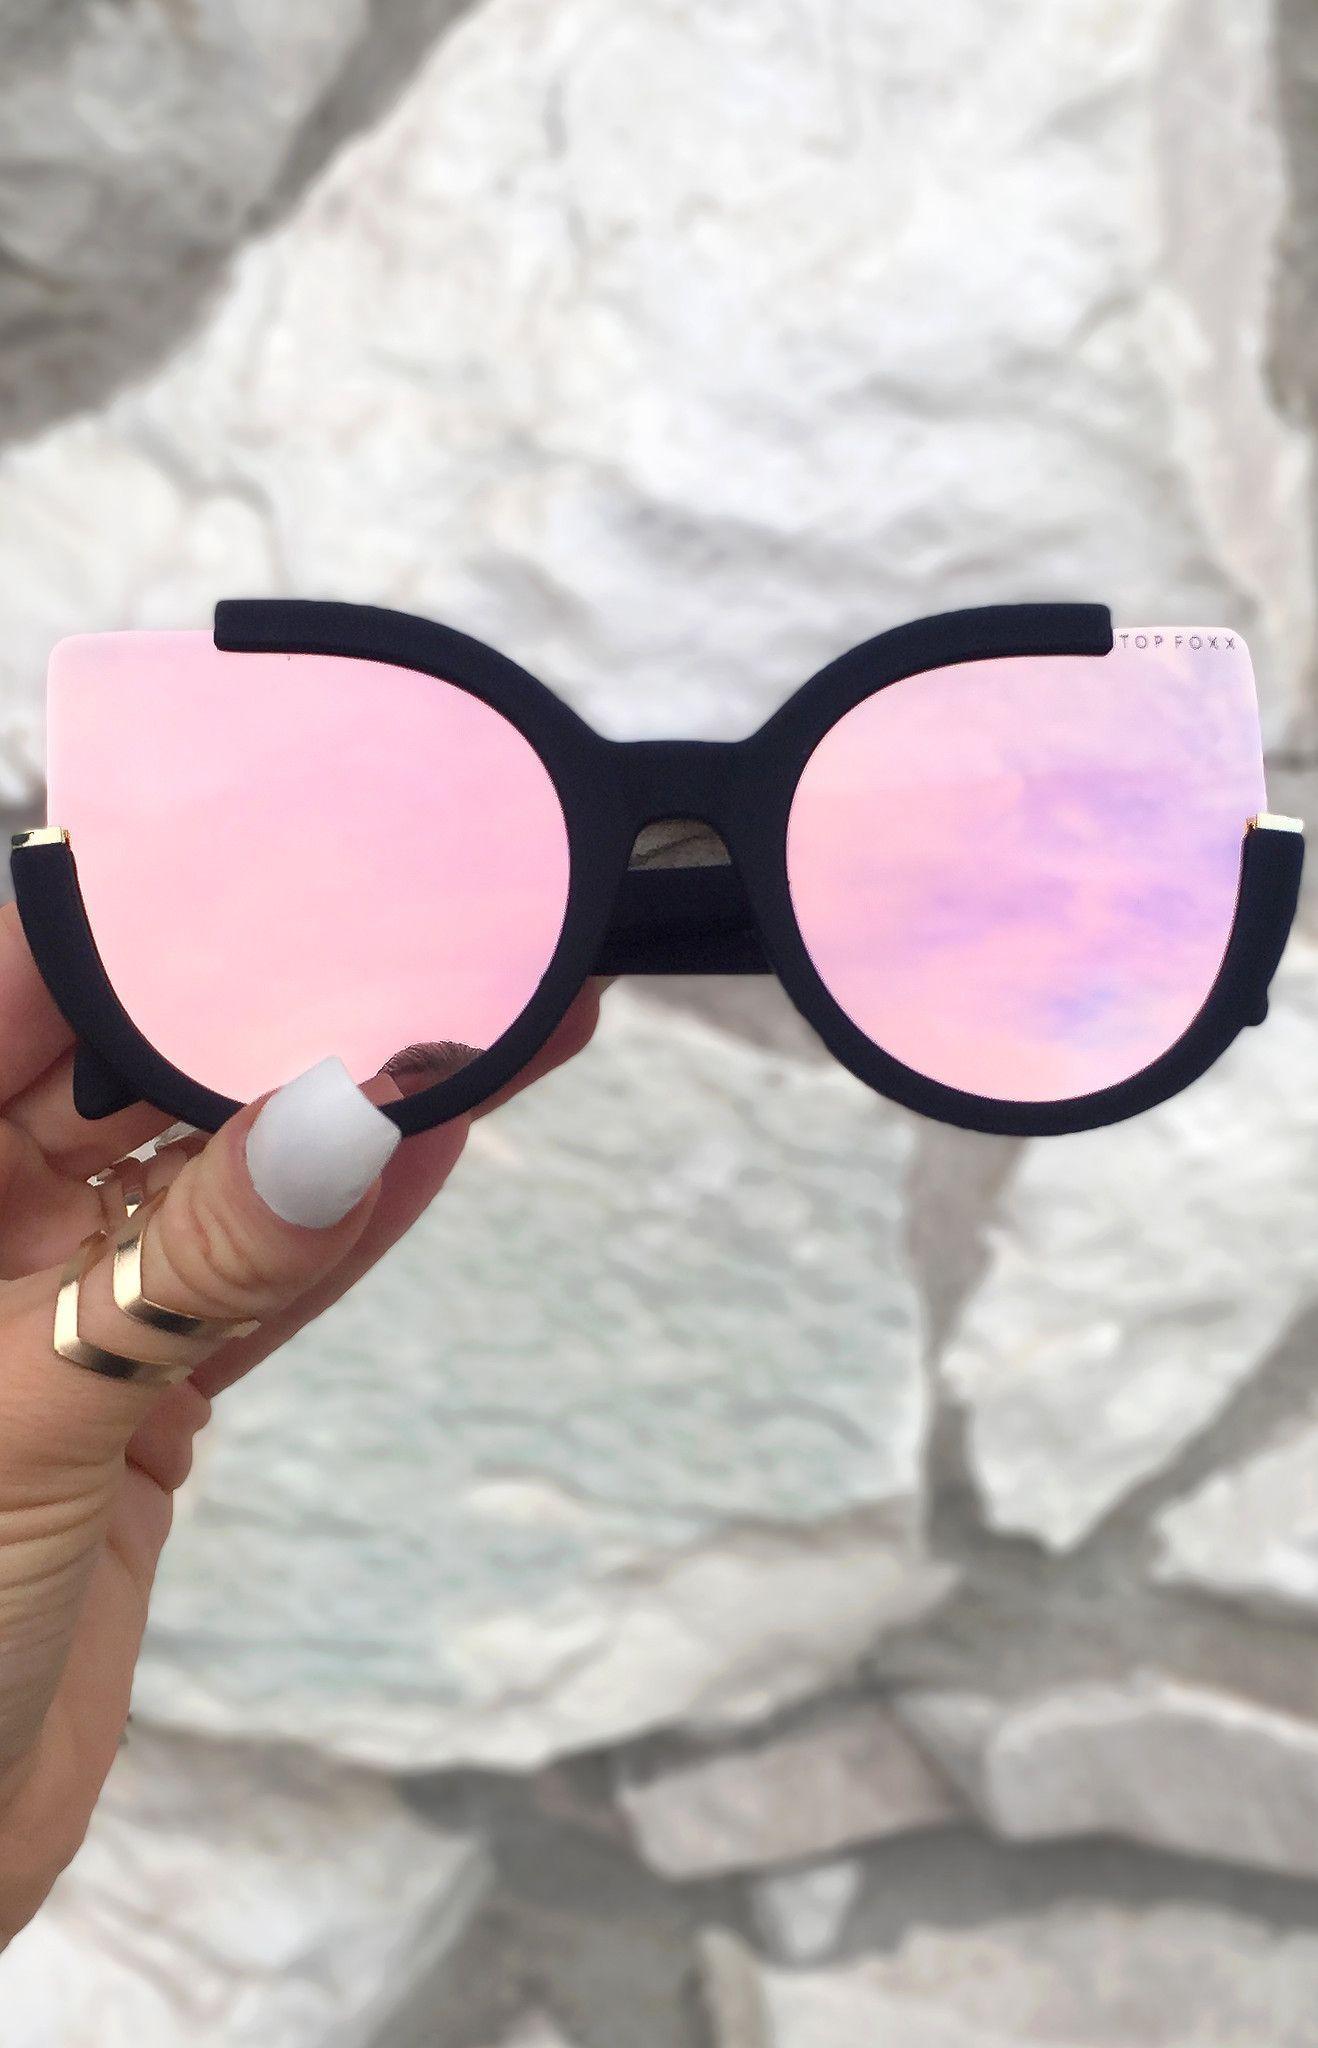 dec4052ac608b Chloe Sunnies - Black  Rosegold Óculos Feminino, Usando Óculos, Roupas  Elegantes,